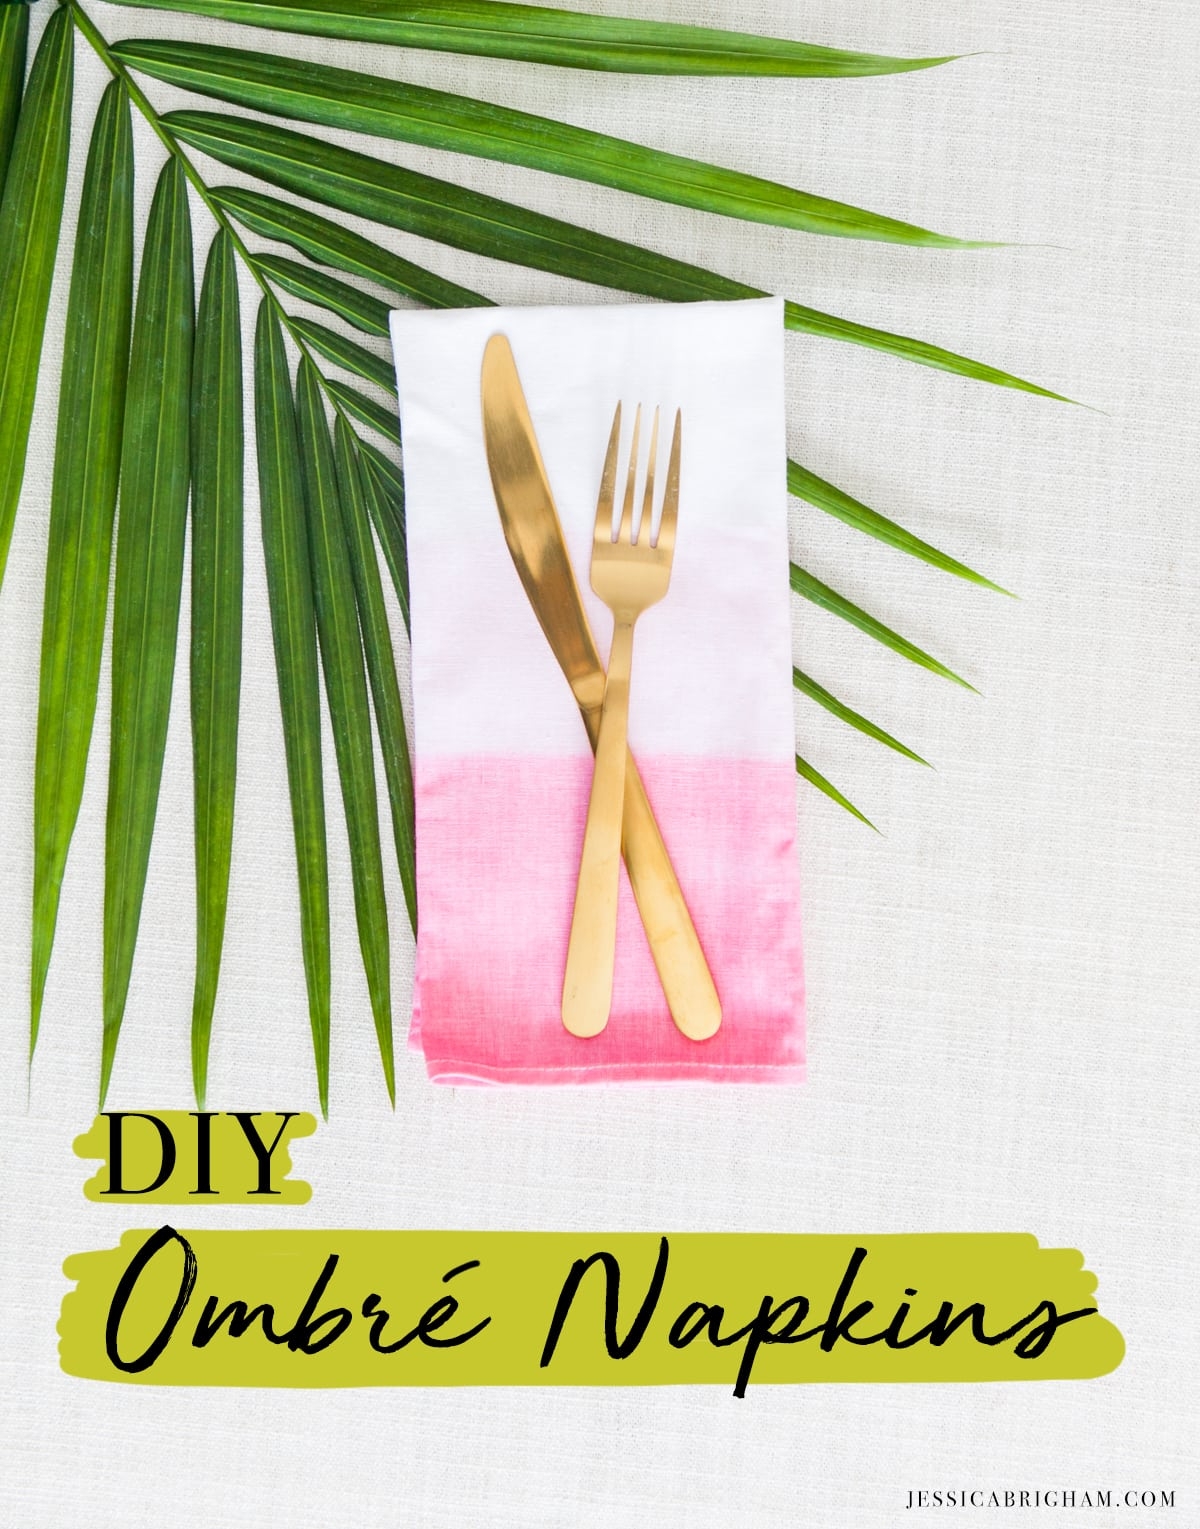 DIY Ombre Napkins | Party Decoration Ideas | Cinco de Mayo Party Supplies | Jessica Brigham | Magazine Ready for Life